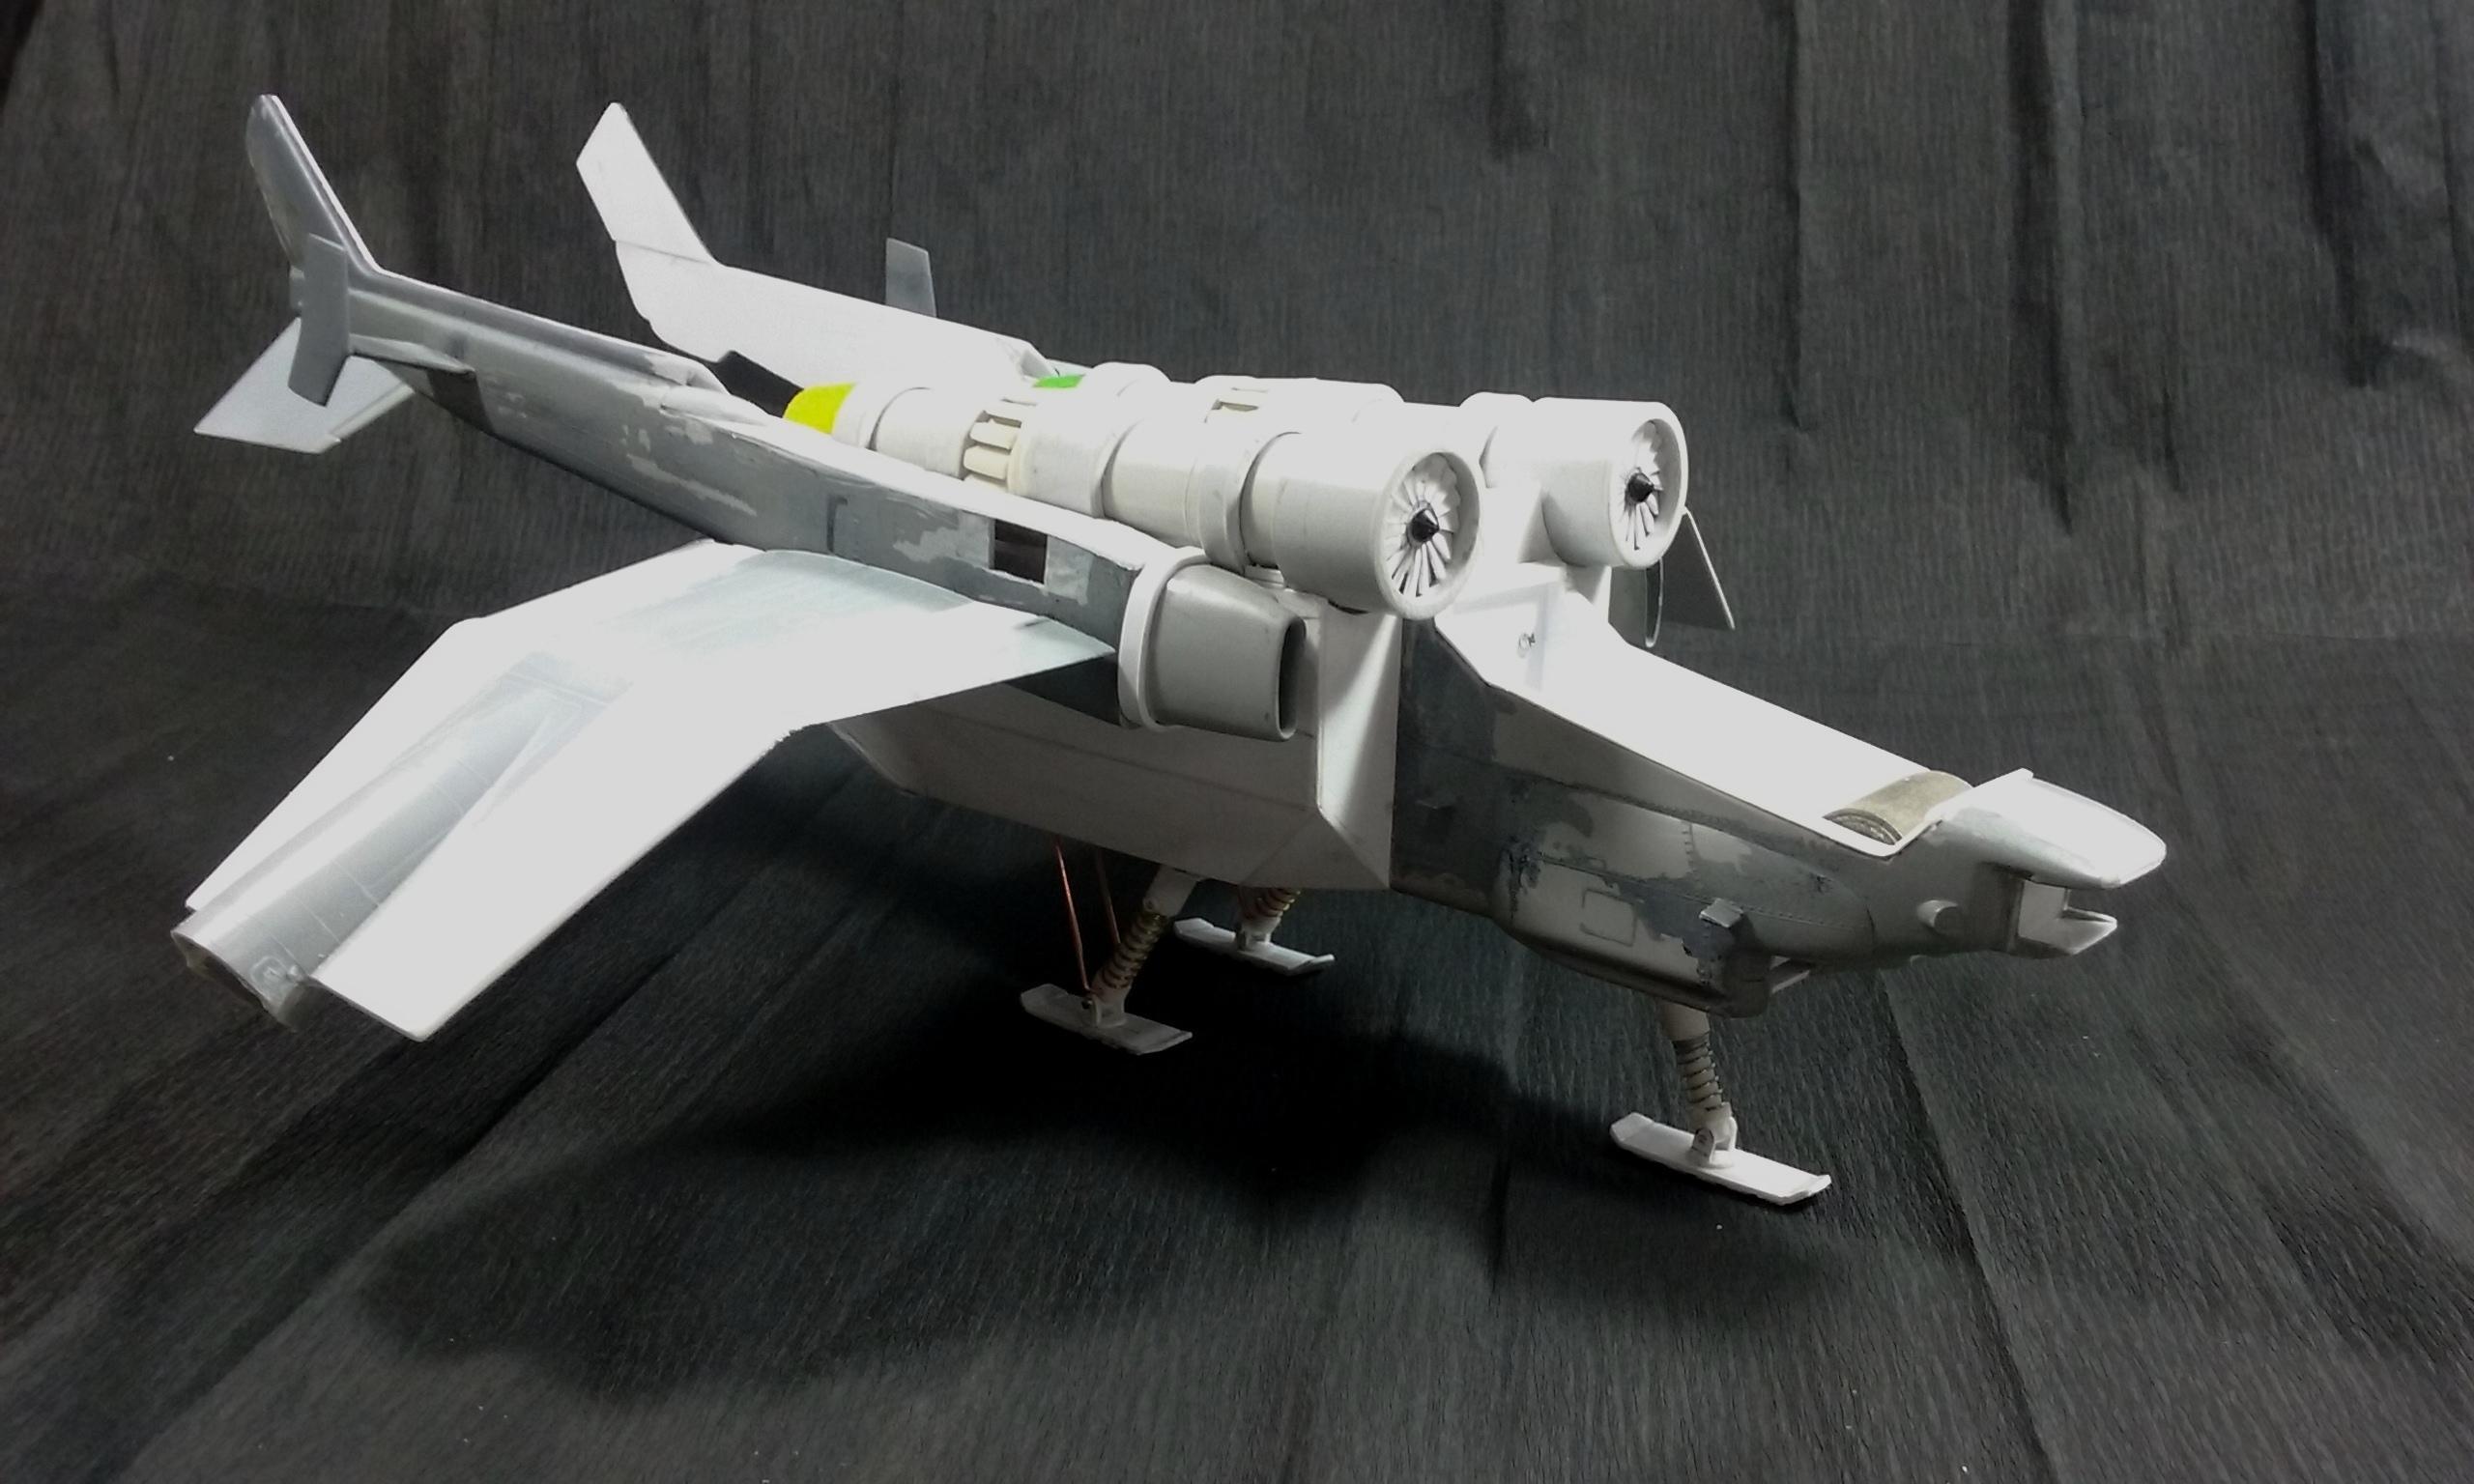 Am, Astra Militarum, Conversion, Imperial Guard, Scale Model, Scratch Build, Valkyrie